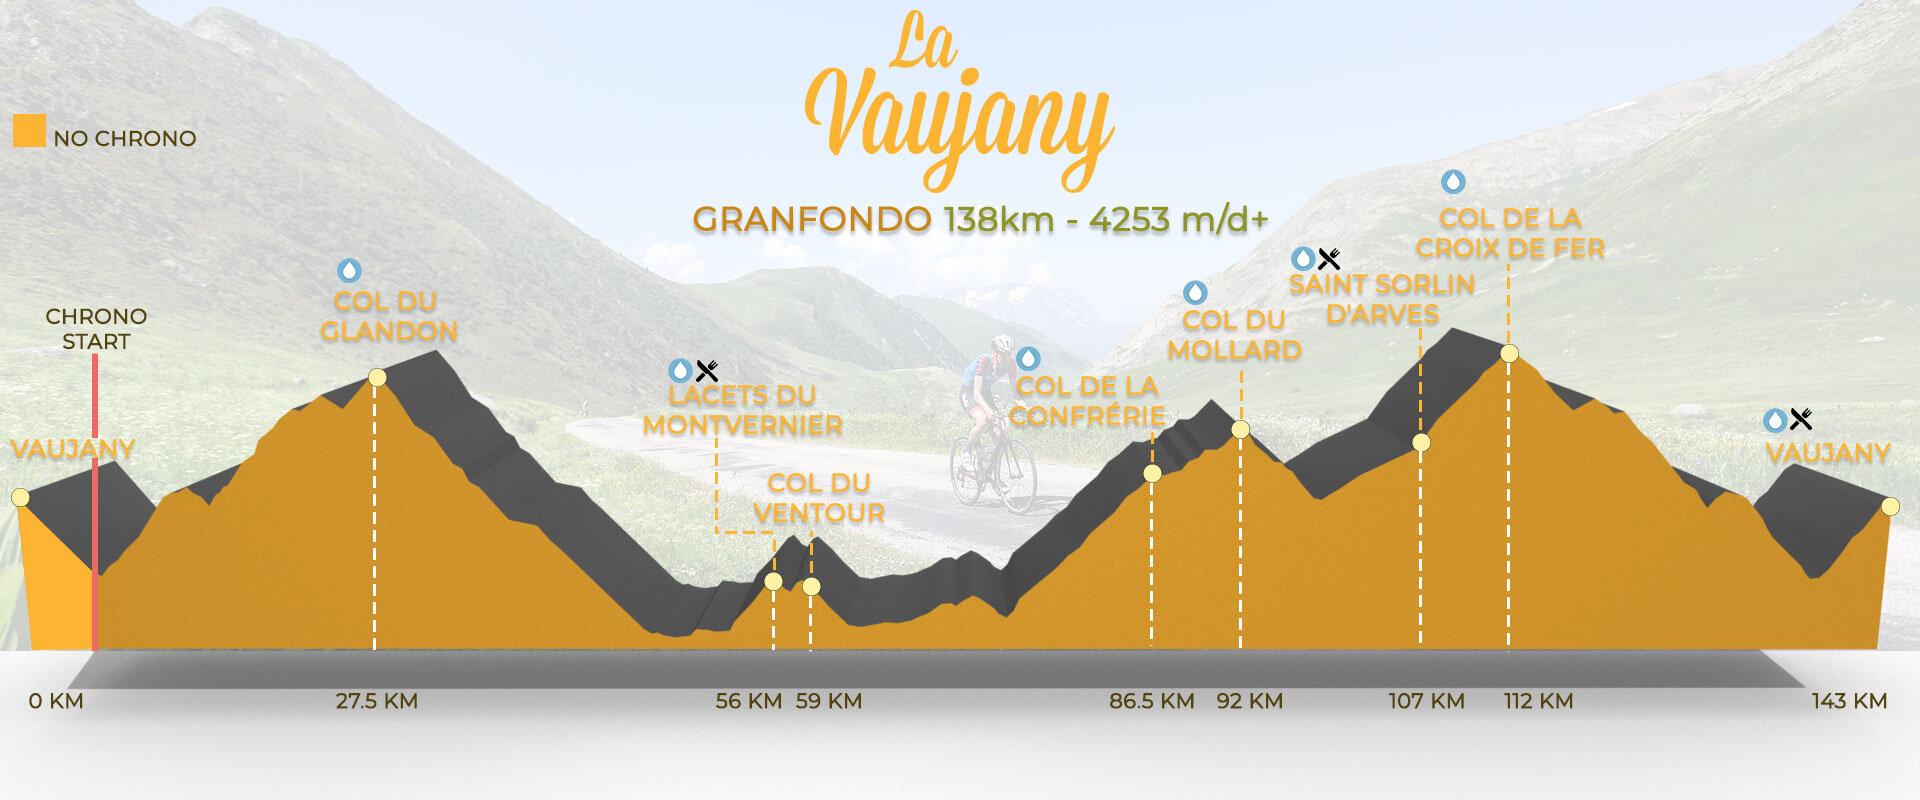 Hoogteprofiel La Vaujany Granfondo